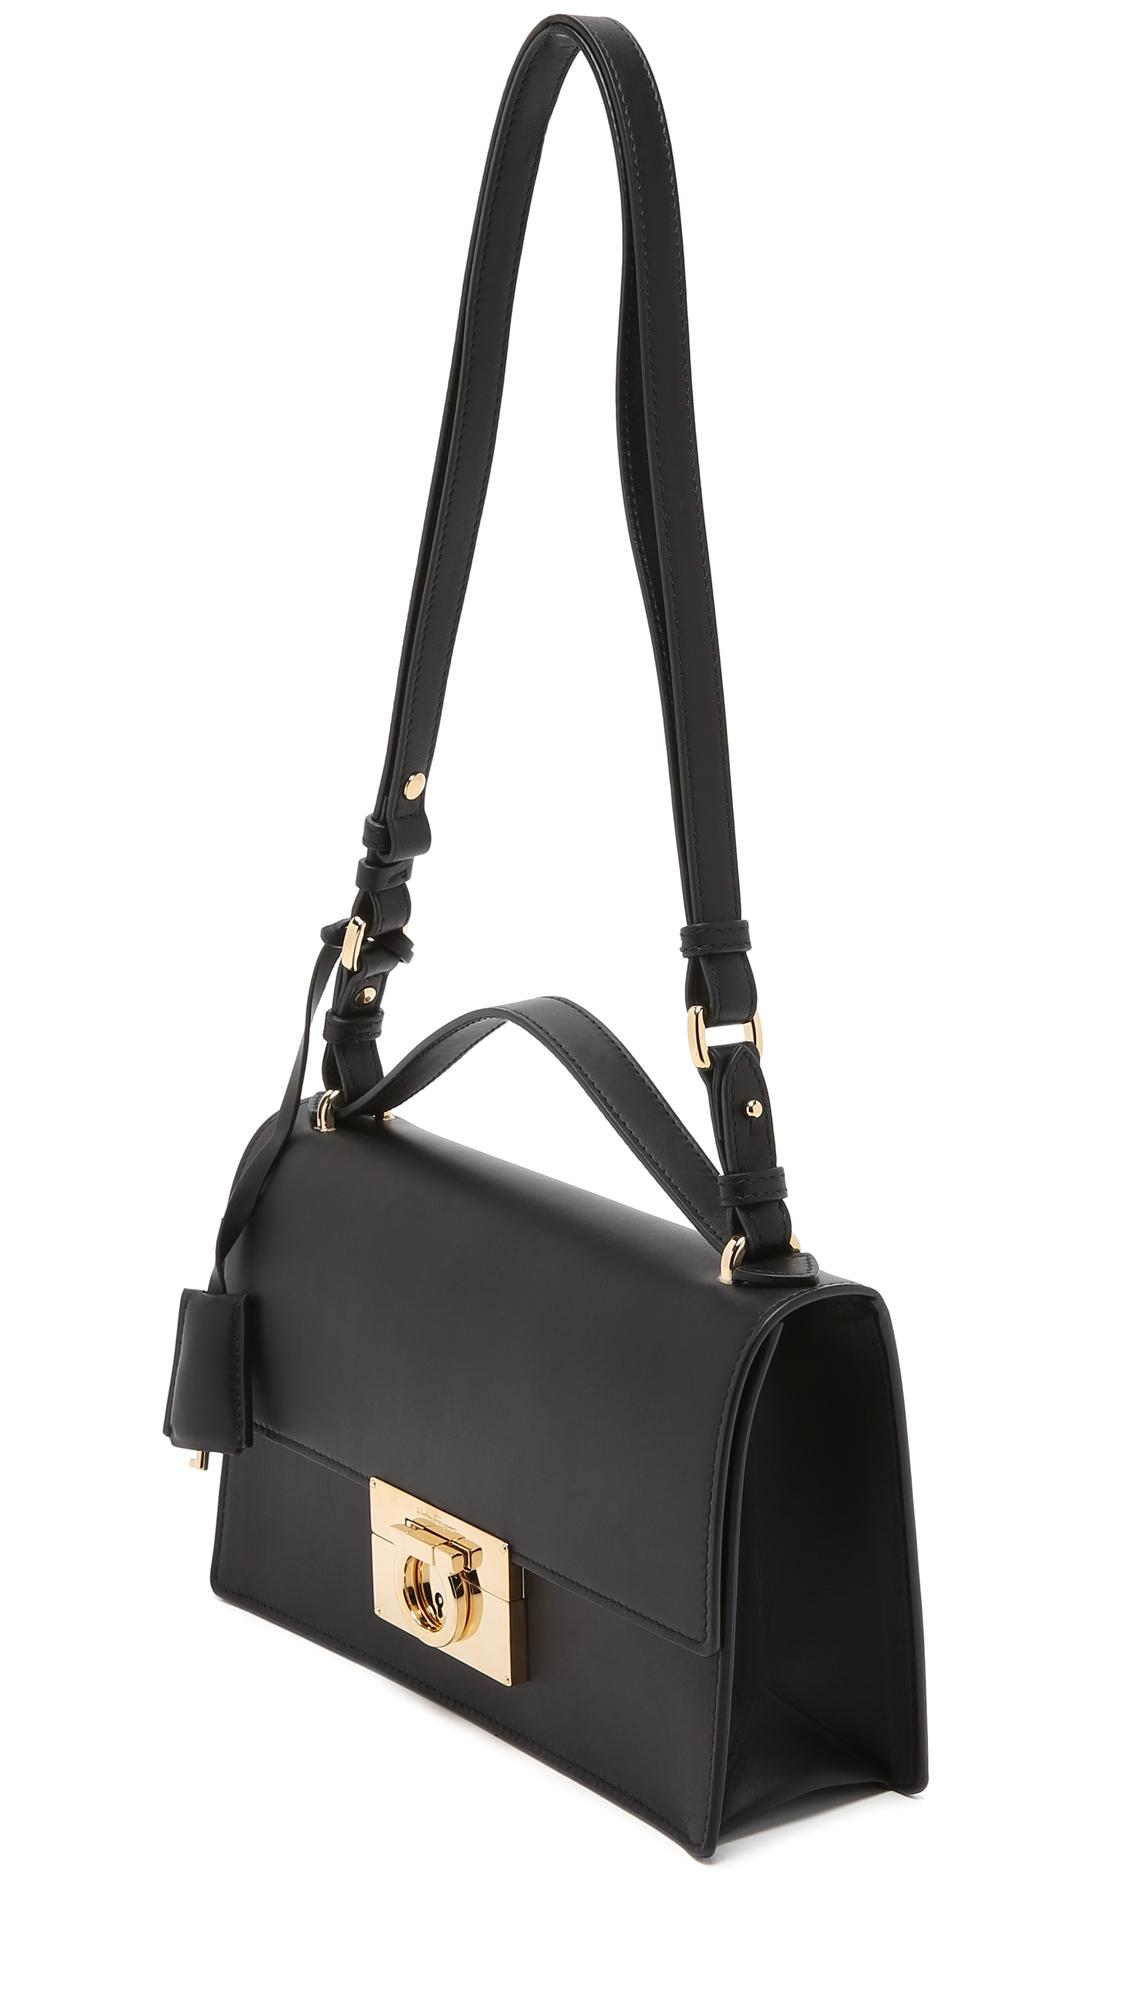 Ferragamo Aileen Shoulder Bag - Black in Black - Lyst fc7cf15ce71d7